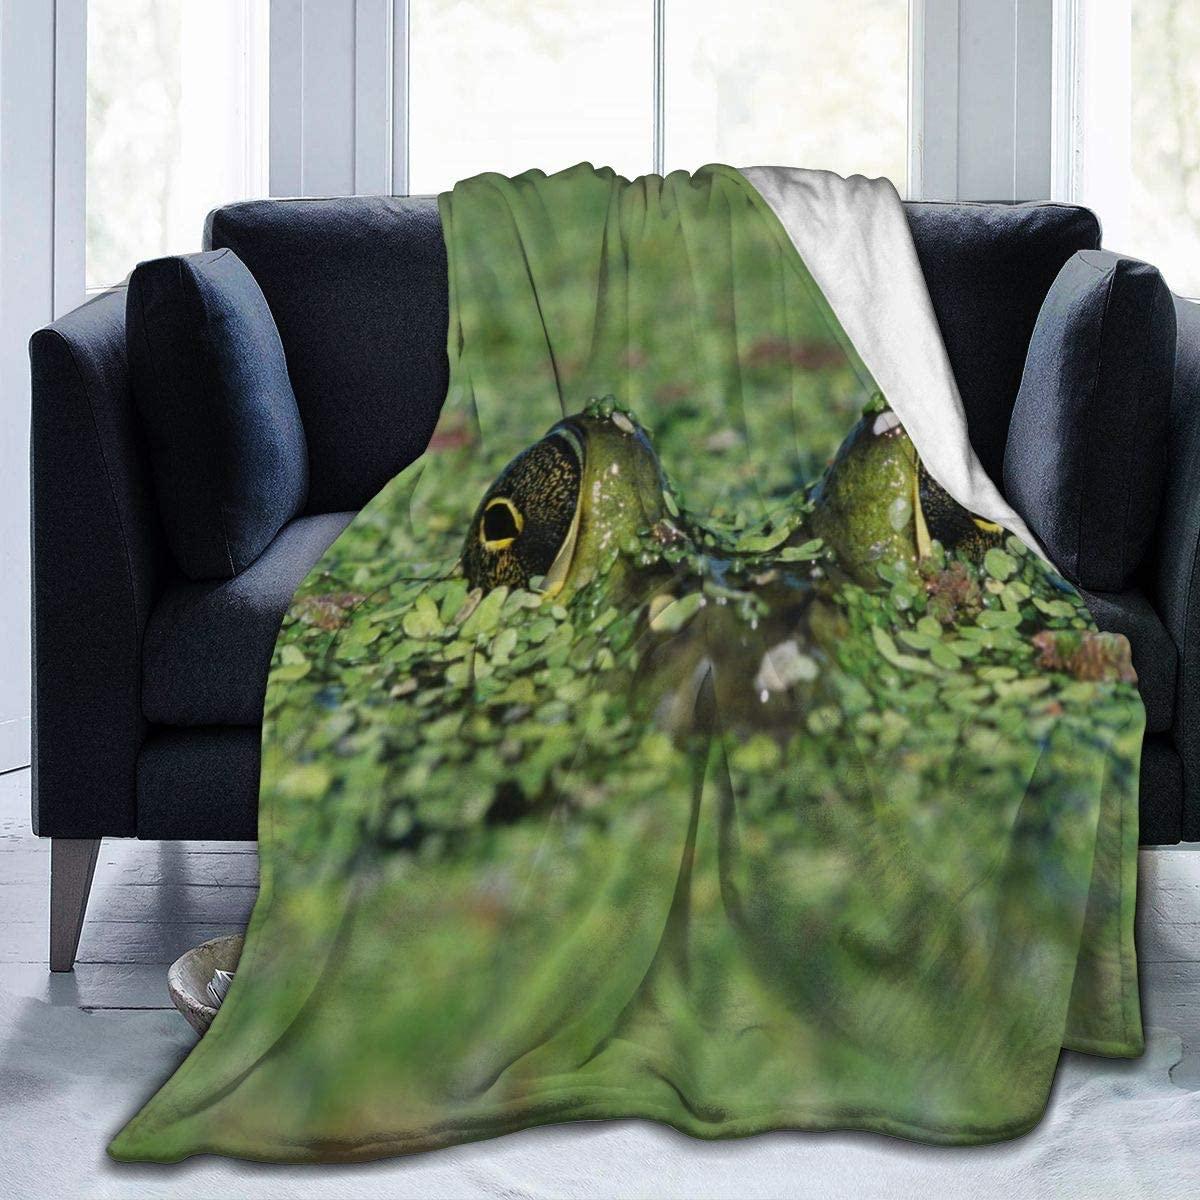 Micro Fleece Plush Soft Baby Blanket Bullfrog Camouflage Duckweed Fluffy Warm Toddler Bed/Crib Blanket Lightweight Flannel Daycare Nap Kids Sleeping Tummy Time Throw Blanket Girls Boy Kid/Baby